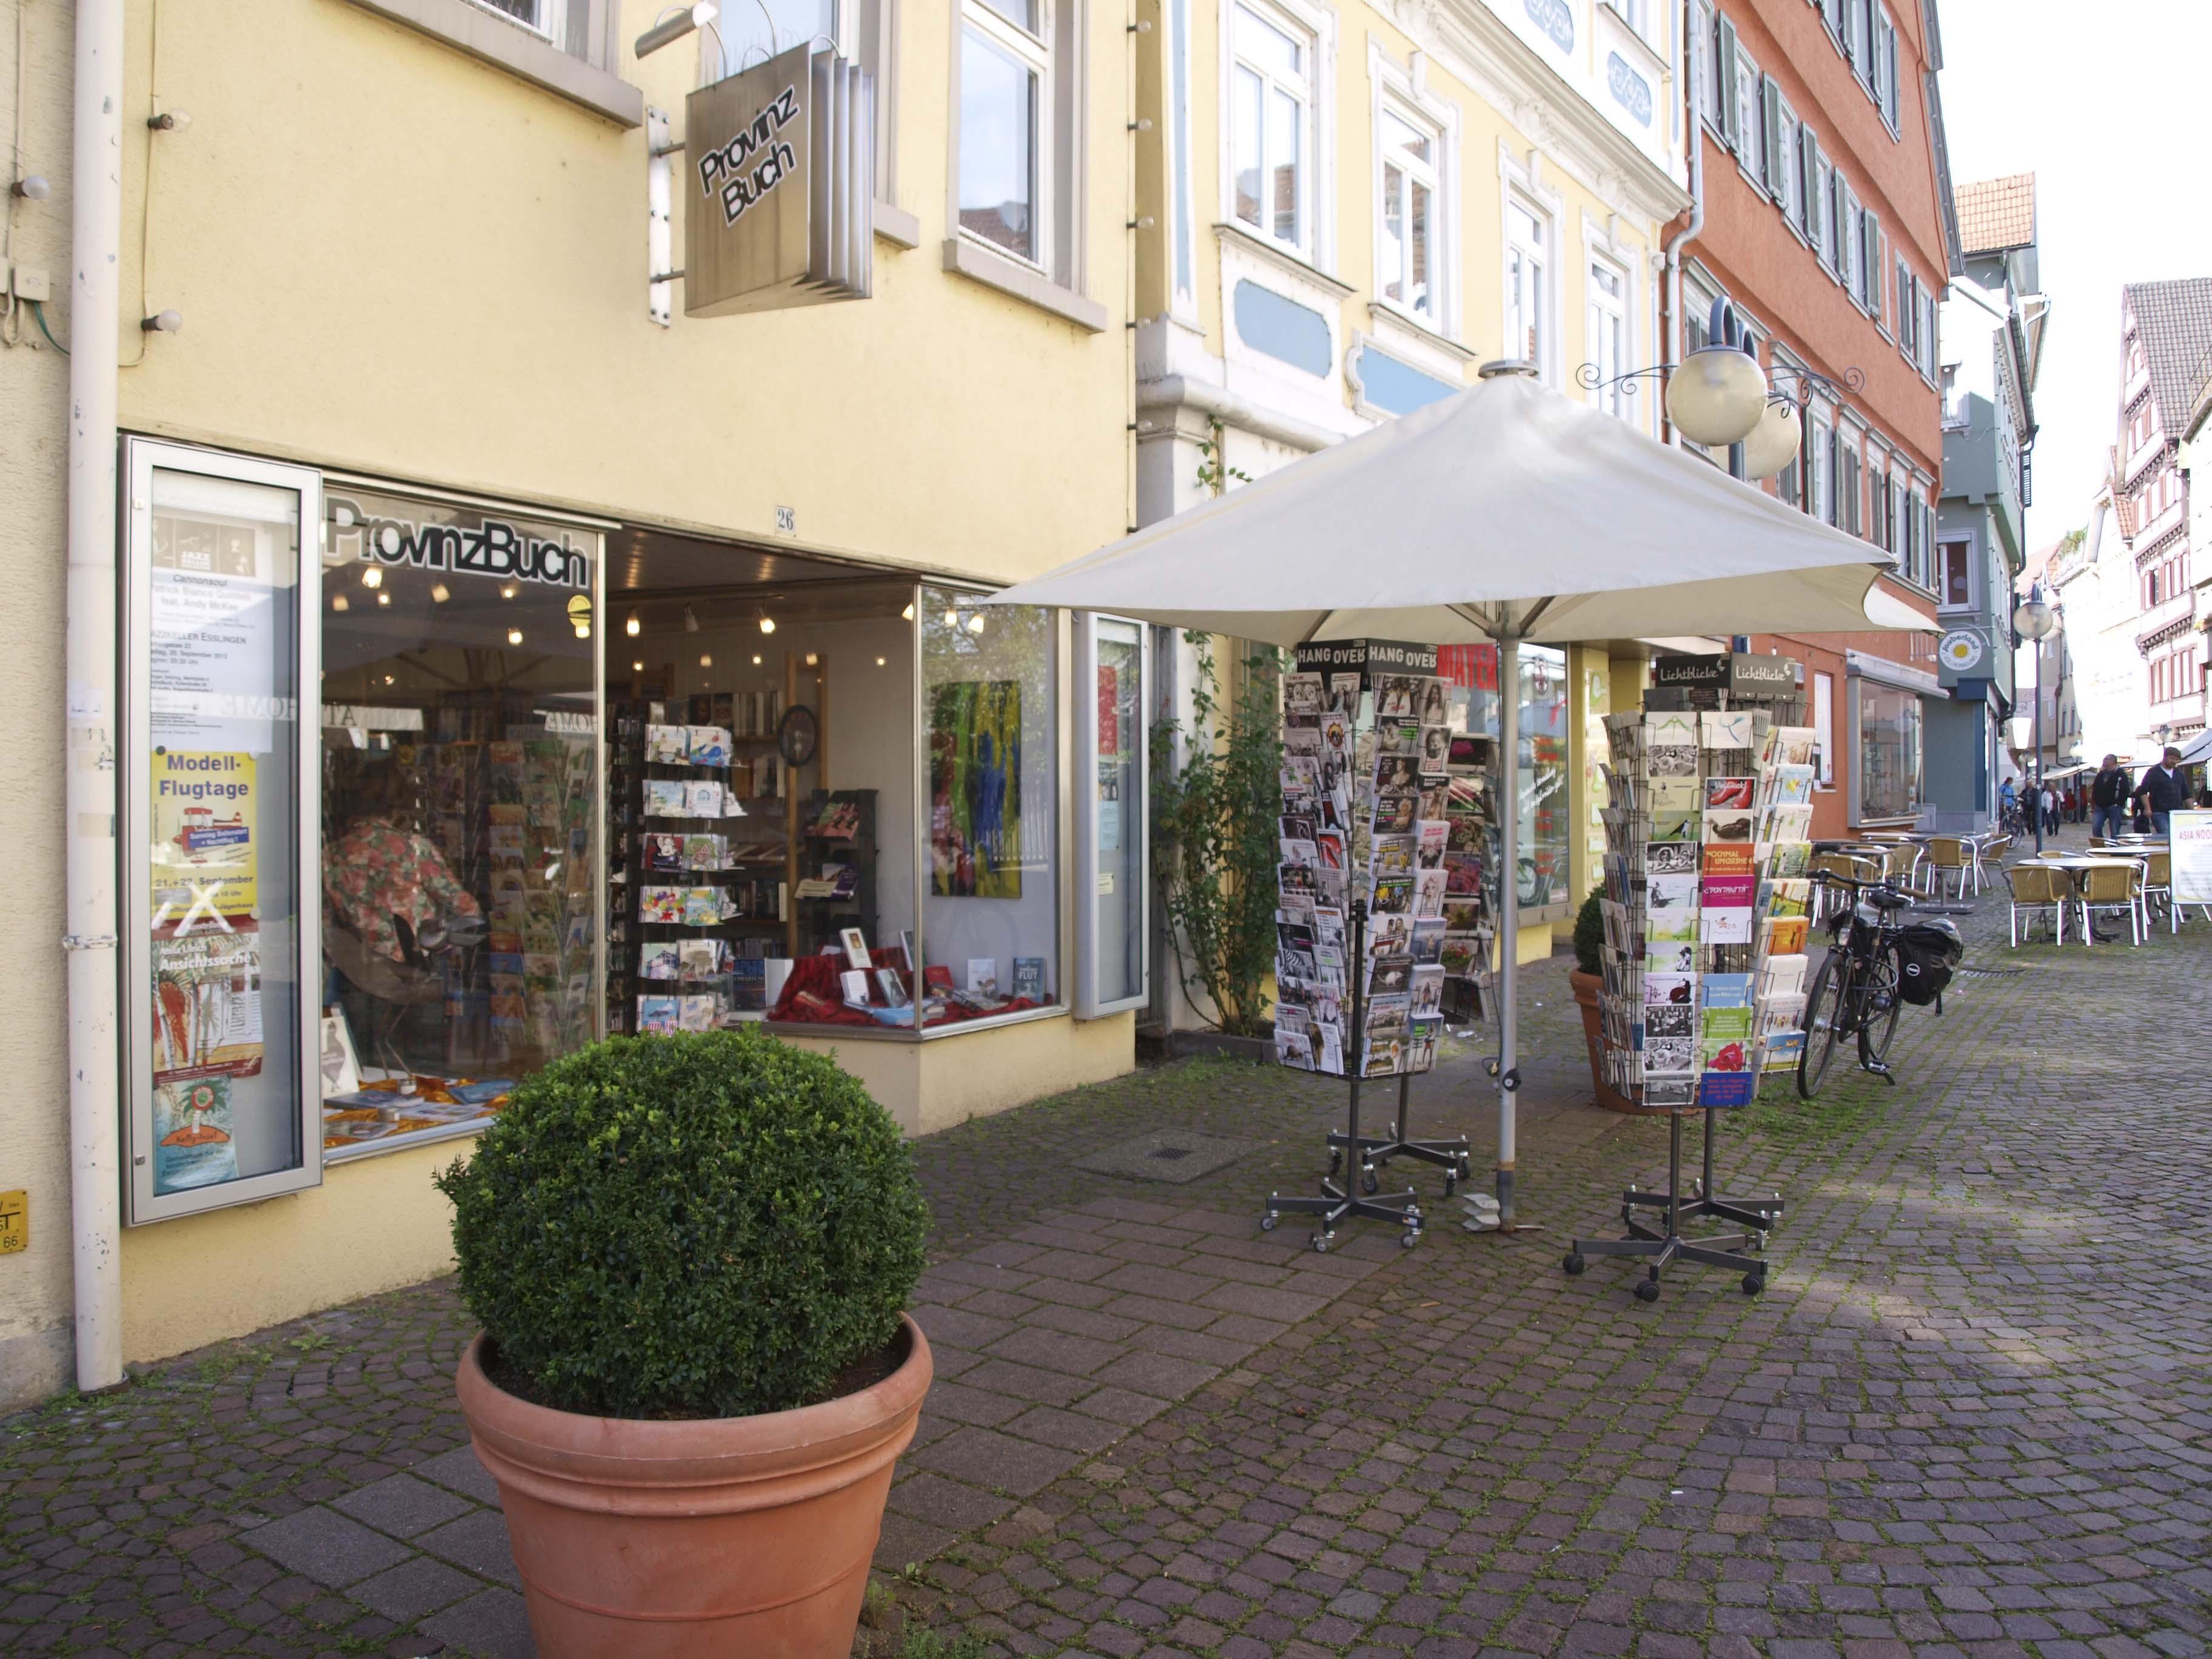 Provinzbuch Küferstraße in Esslingen